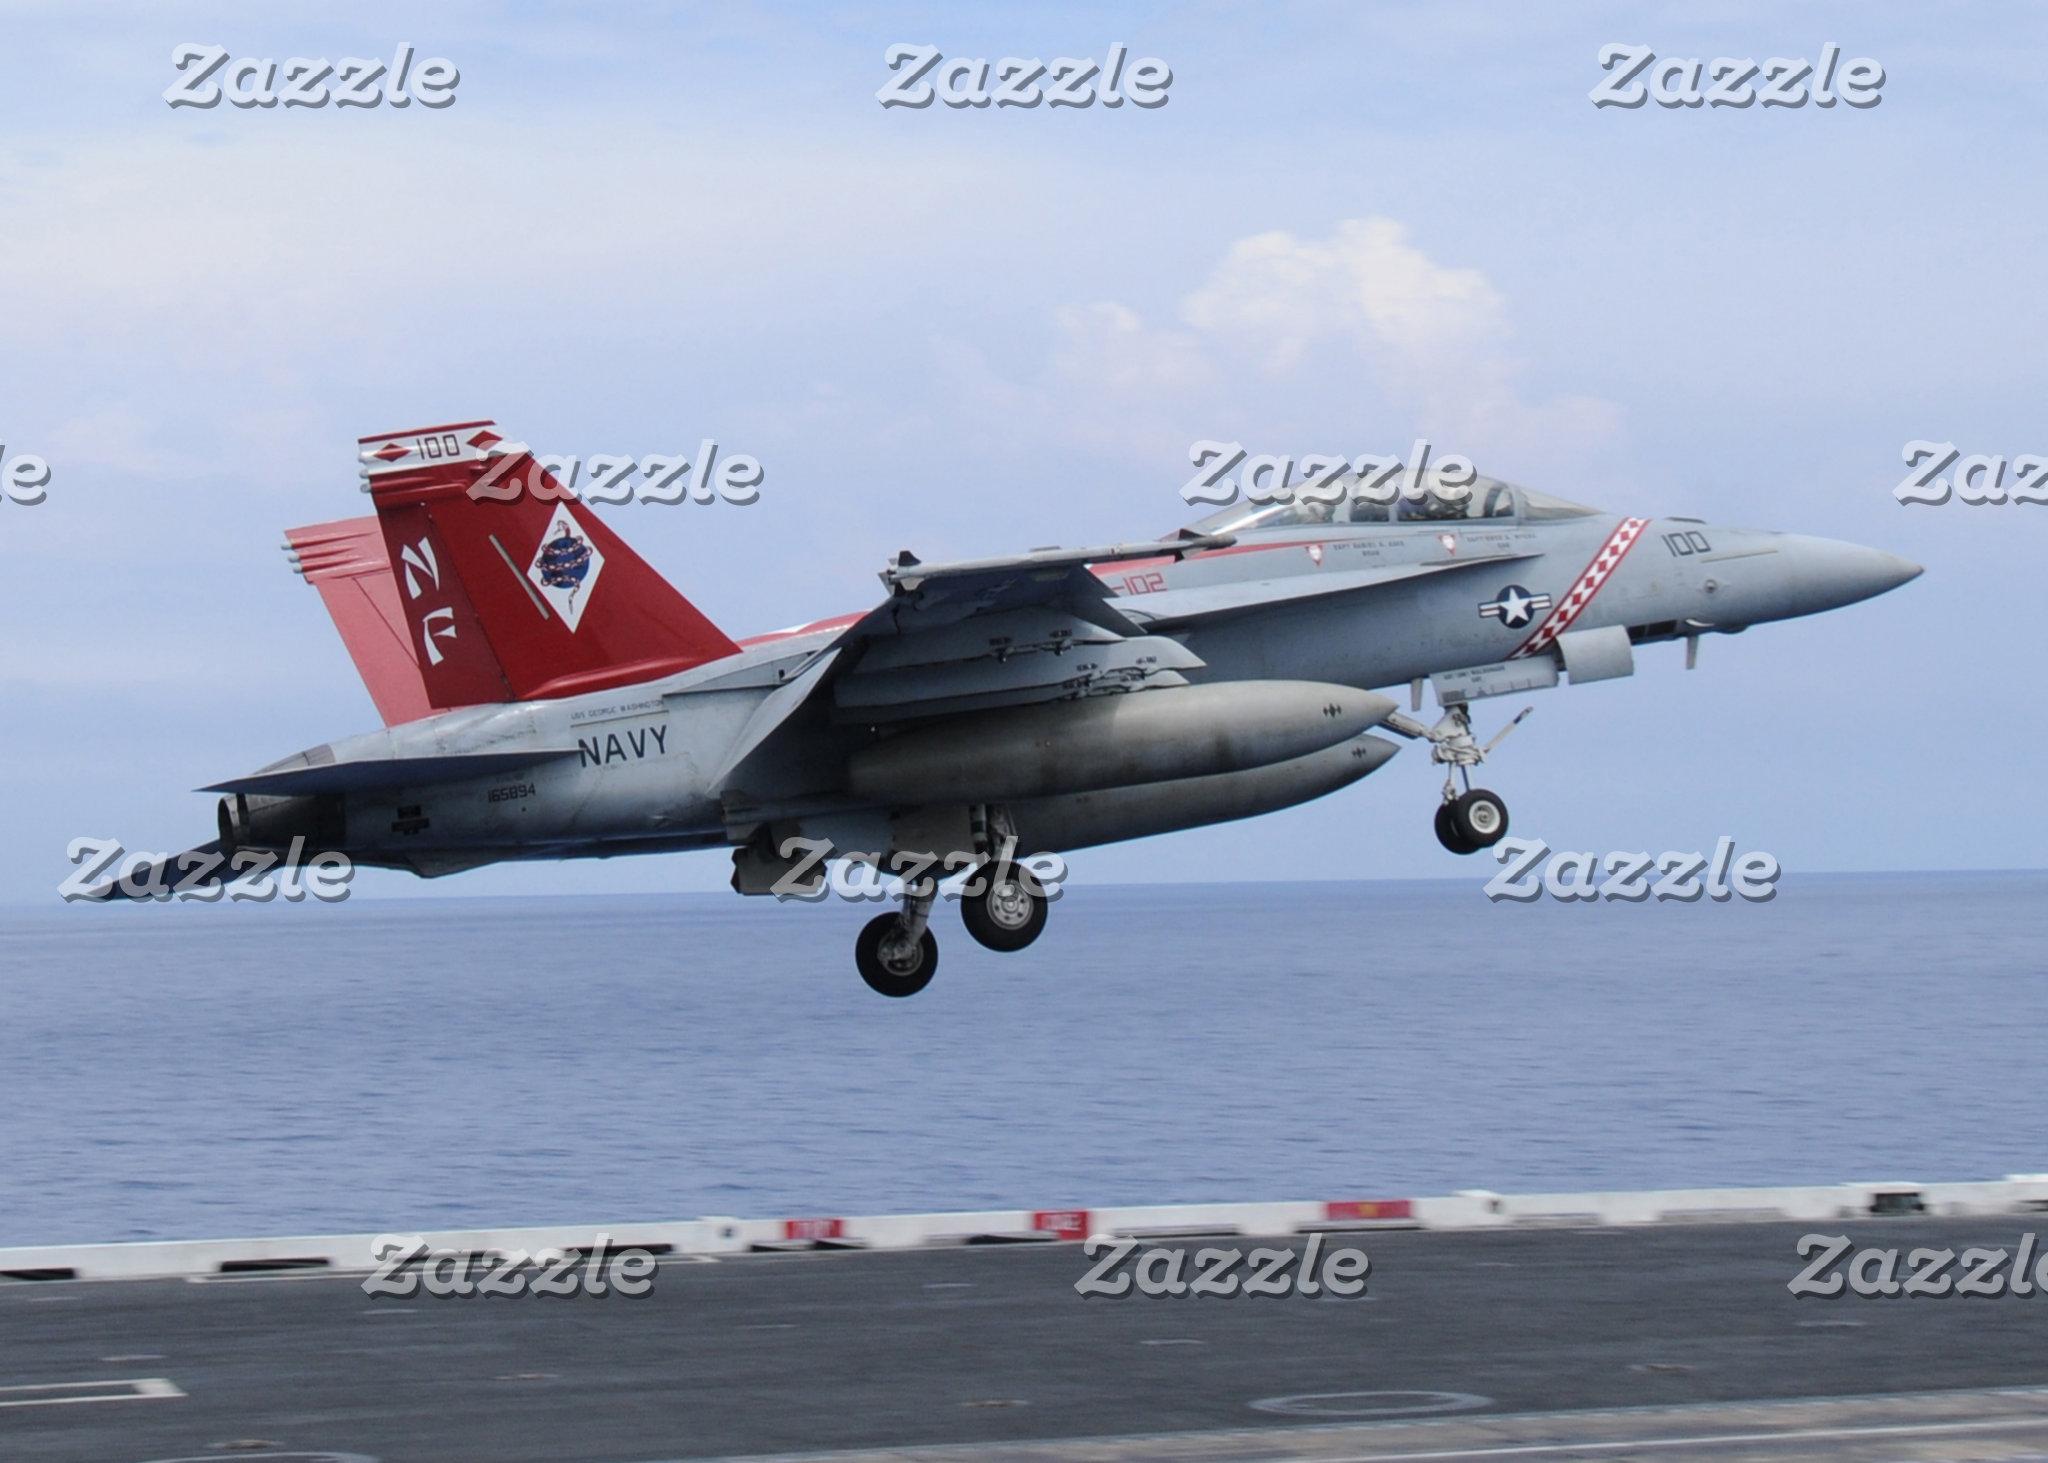 Navy Aircraft - Posters 1